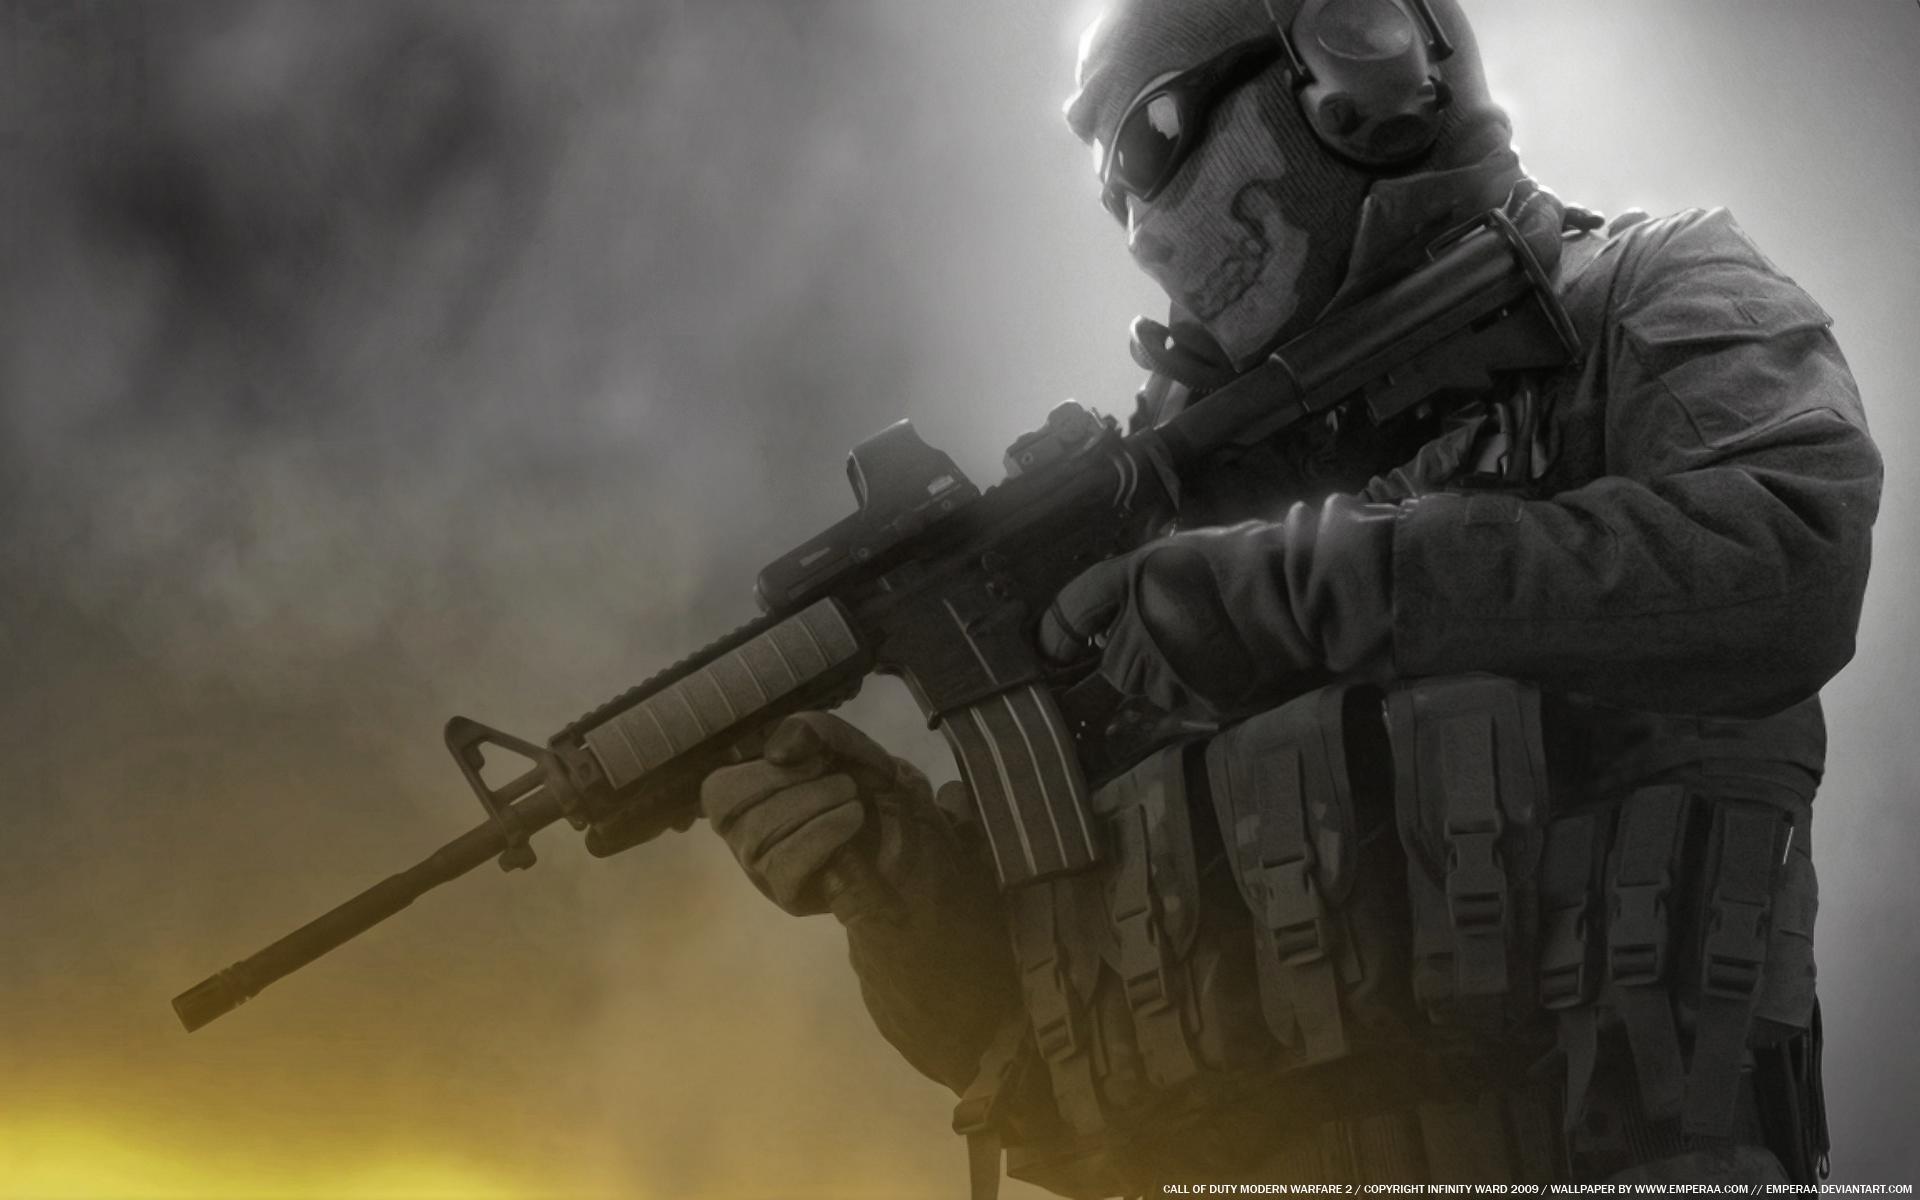 Game Hd Wallpaper